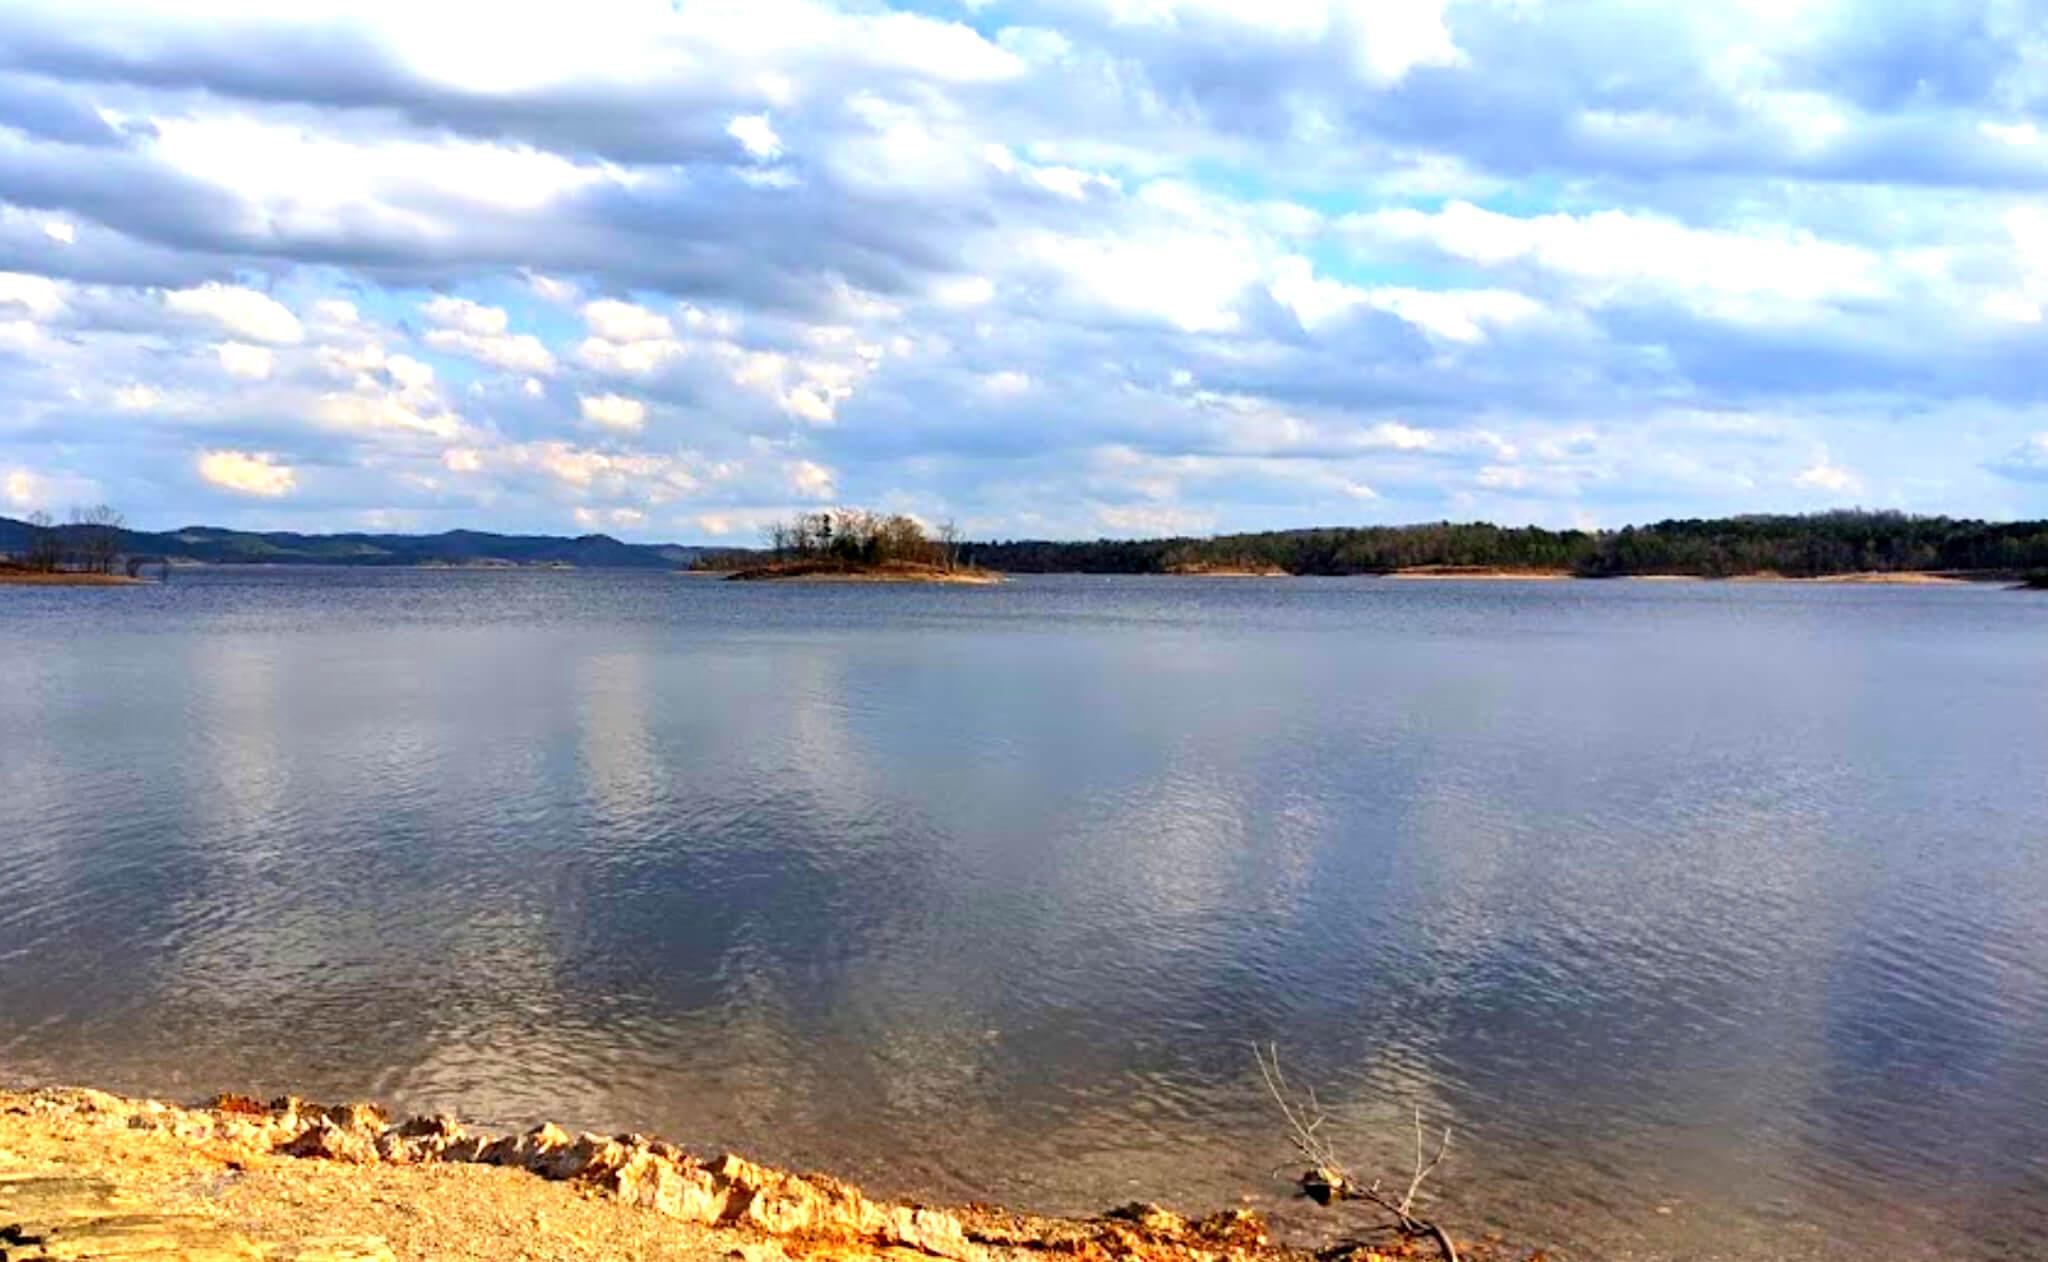 Broken-Bow-Lake-Fishing-Report-Guide-Oklahoma-OK-06